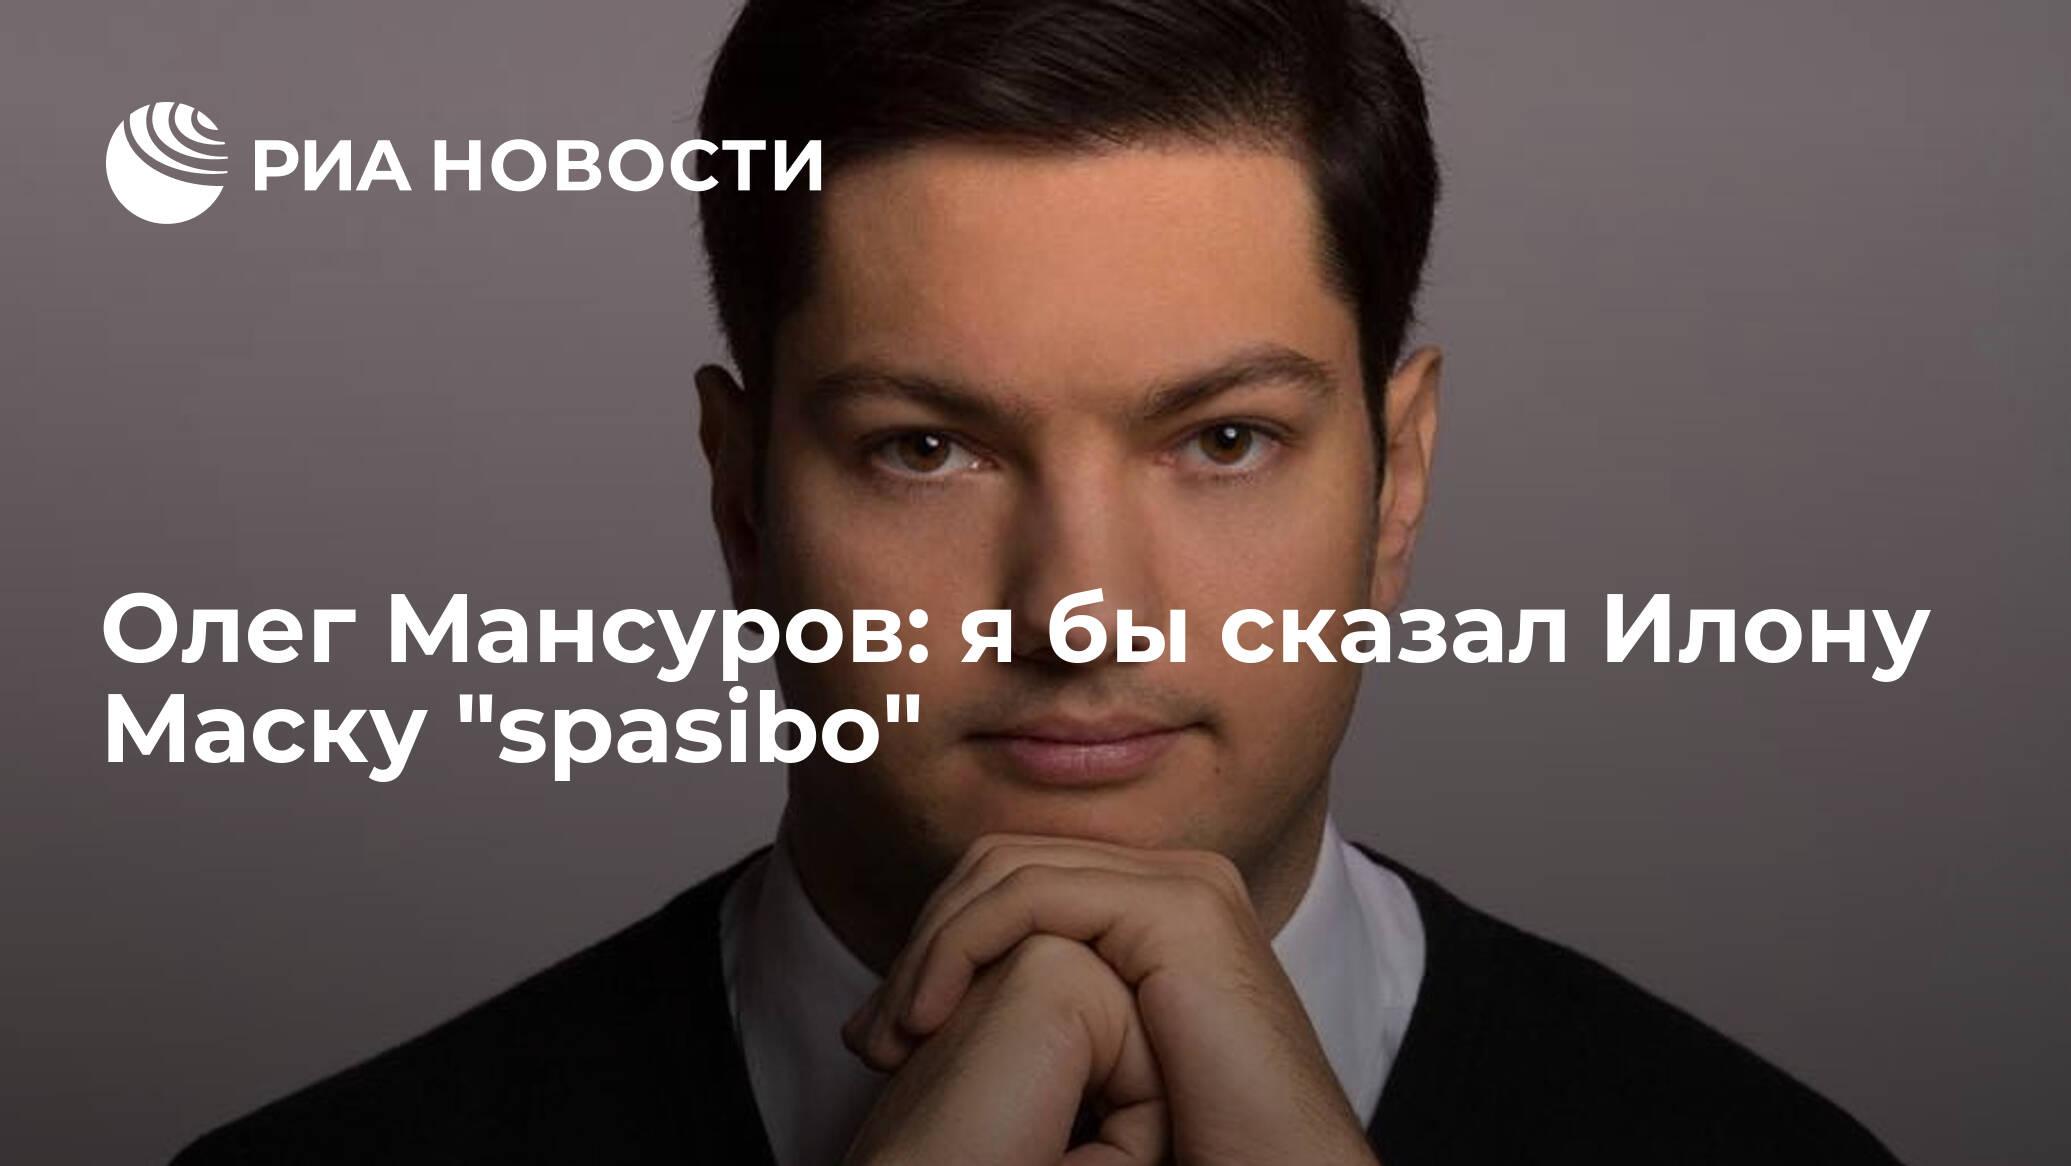 https://cdn23.img.ria.ru/images/sharing/article/1736287168.jpg?17362644281623308416